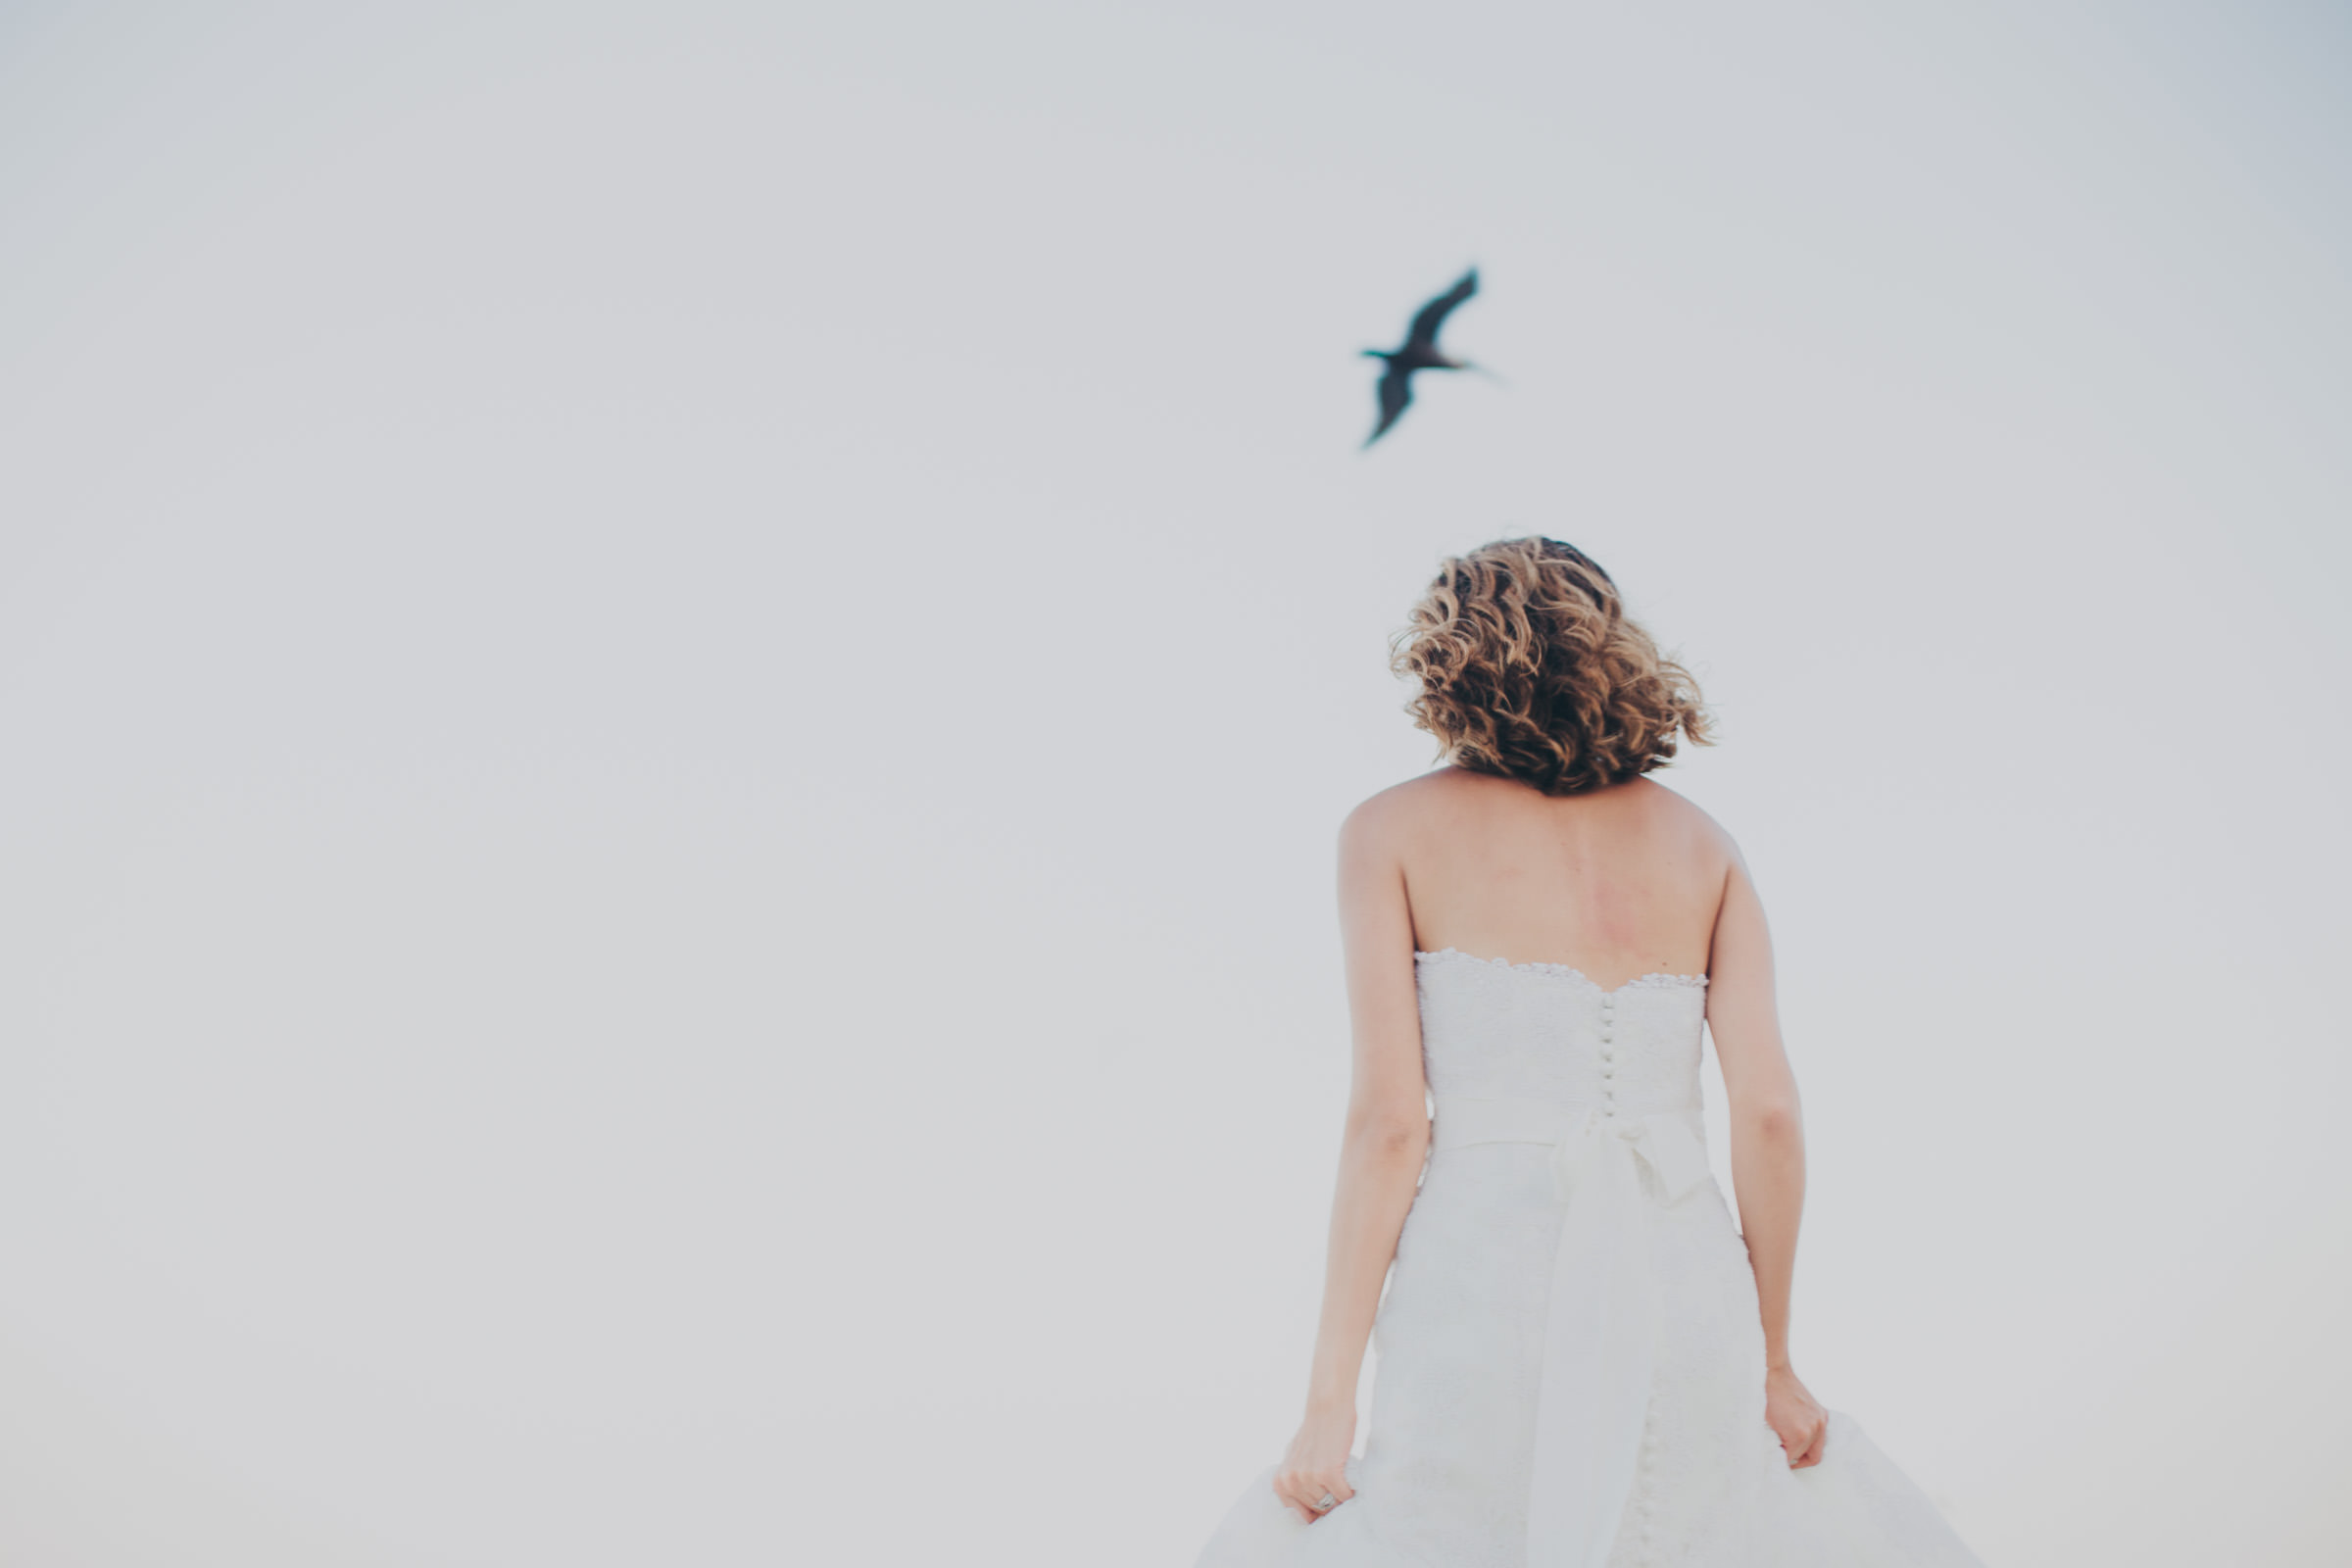 Tulum-Wedding-Photography-Bride-Pierce--79.jpg